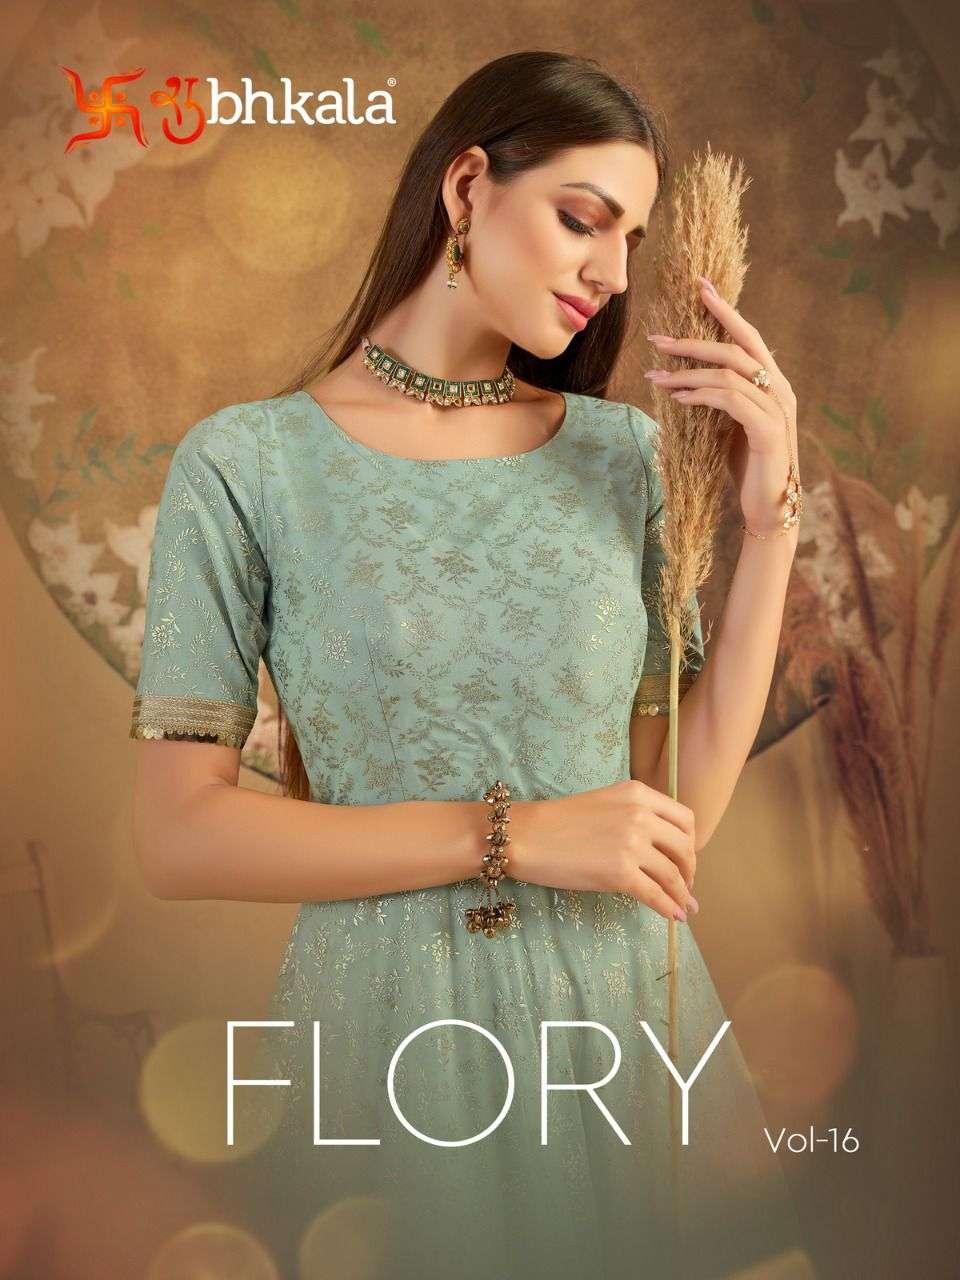 Shubhkala Flory Vol 16 Designer Anarkali Dress New catalog Supplier